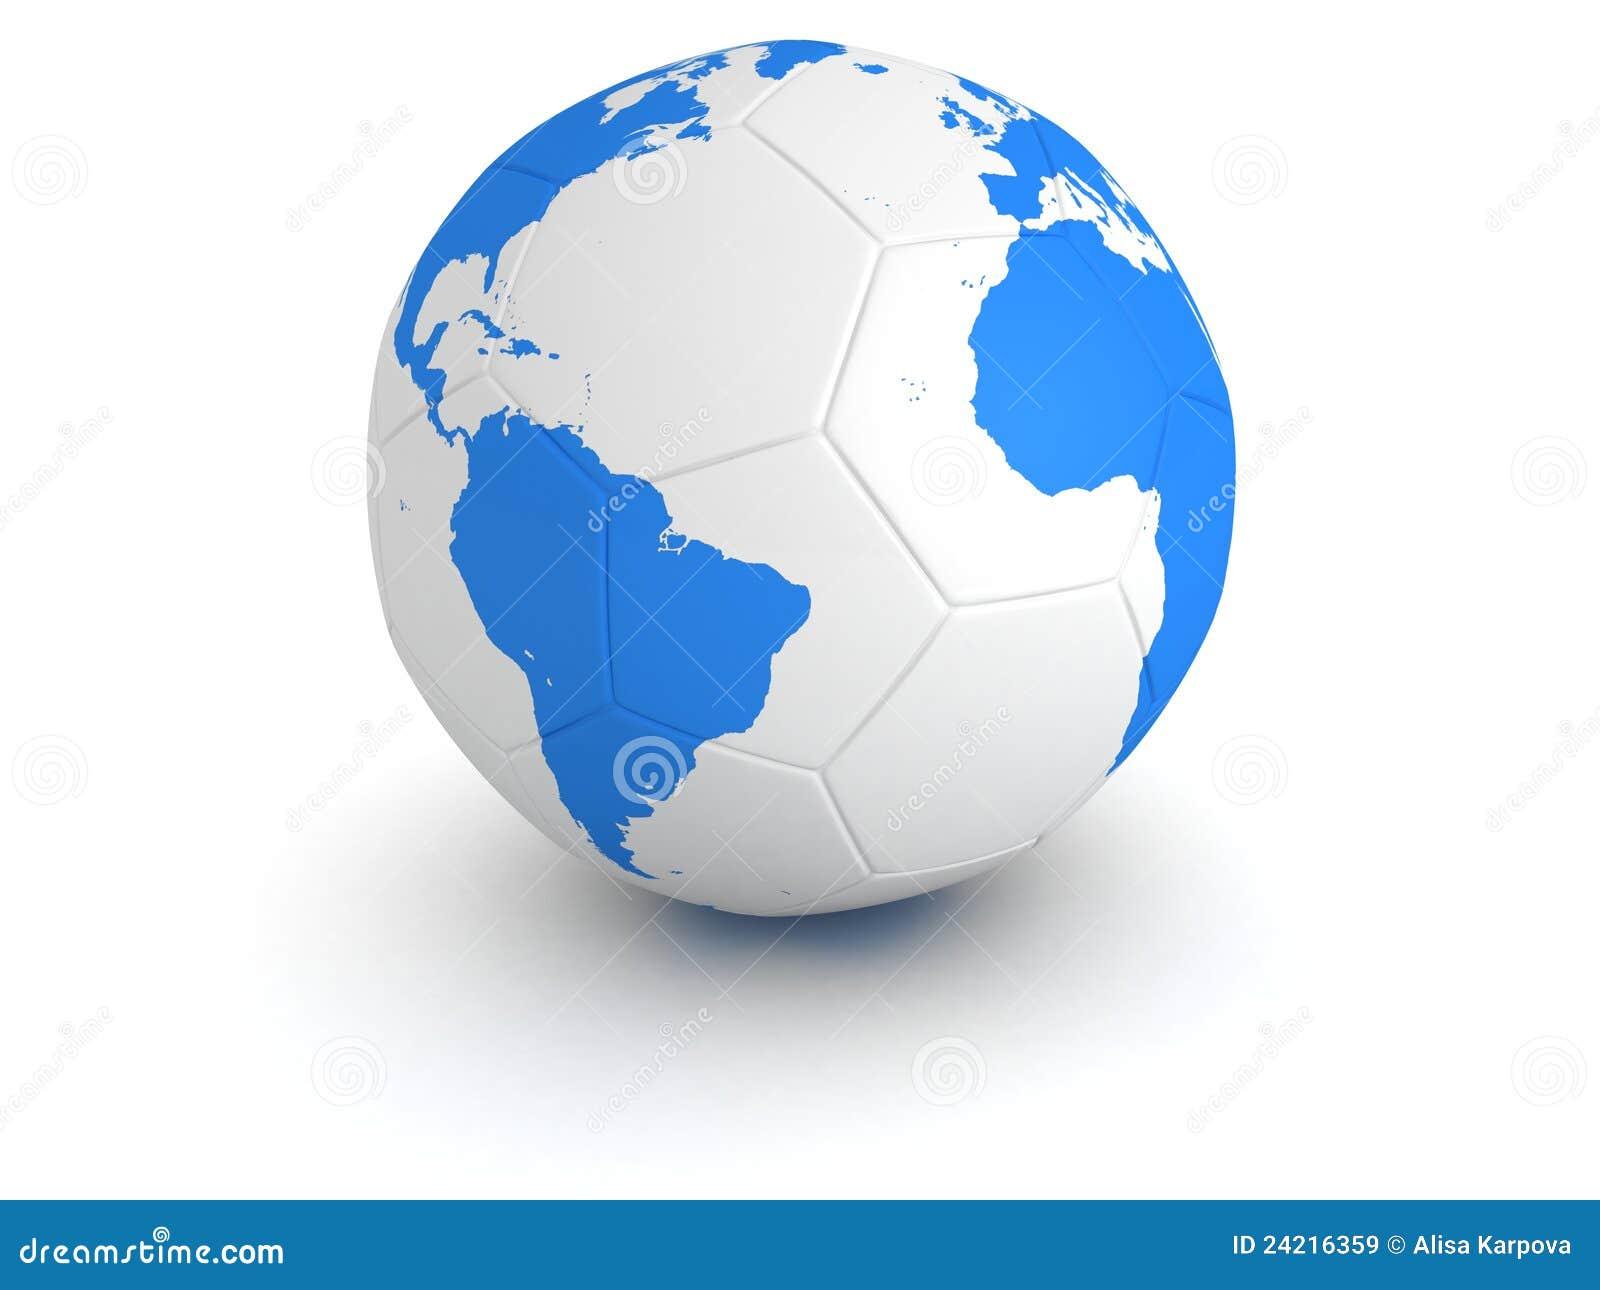 Blue World Globe Map On White Soccer Ball Royalty Free ...